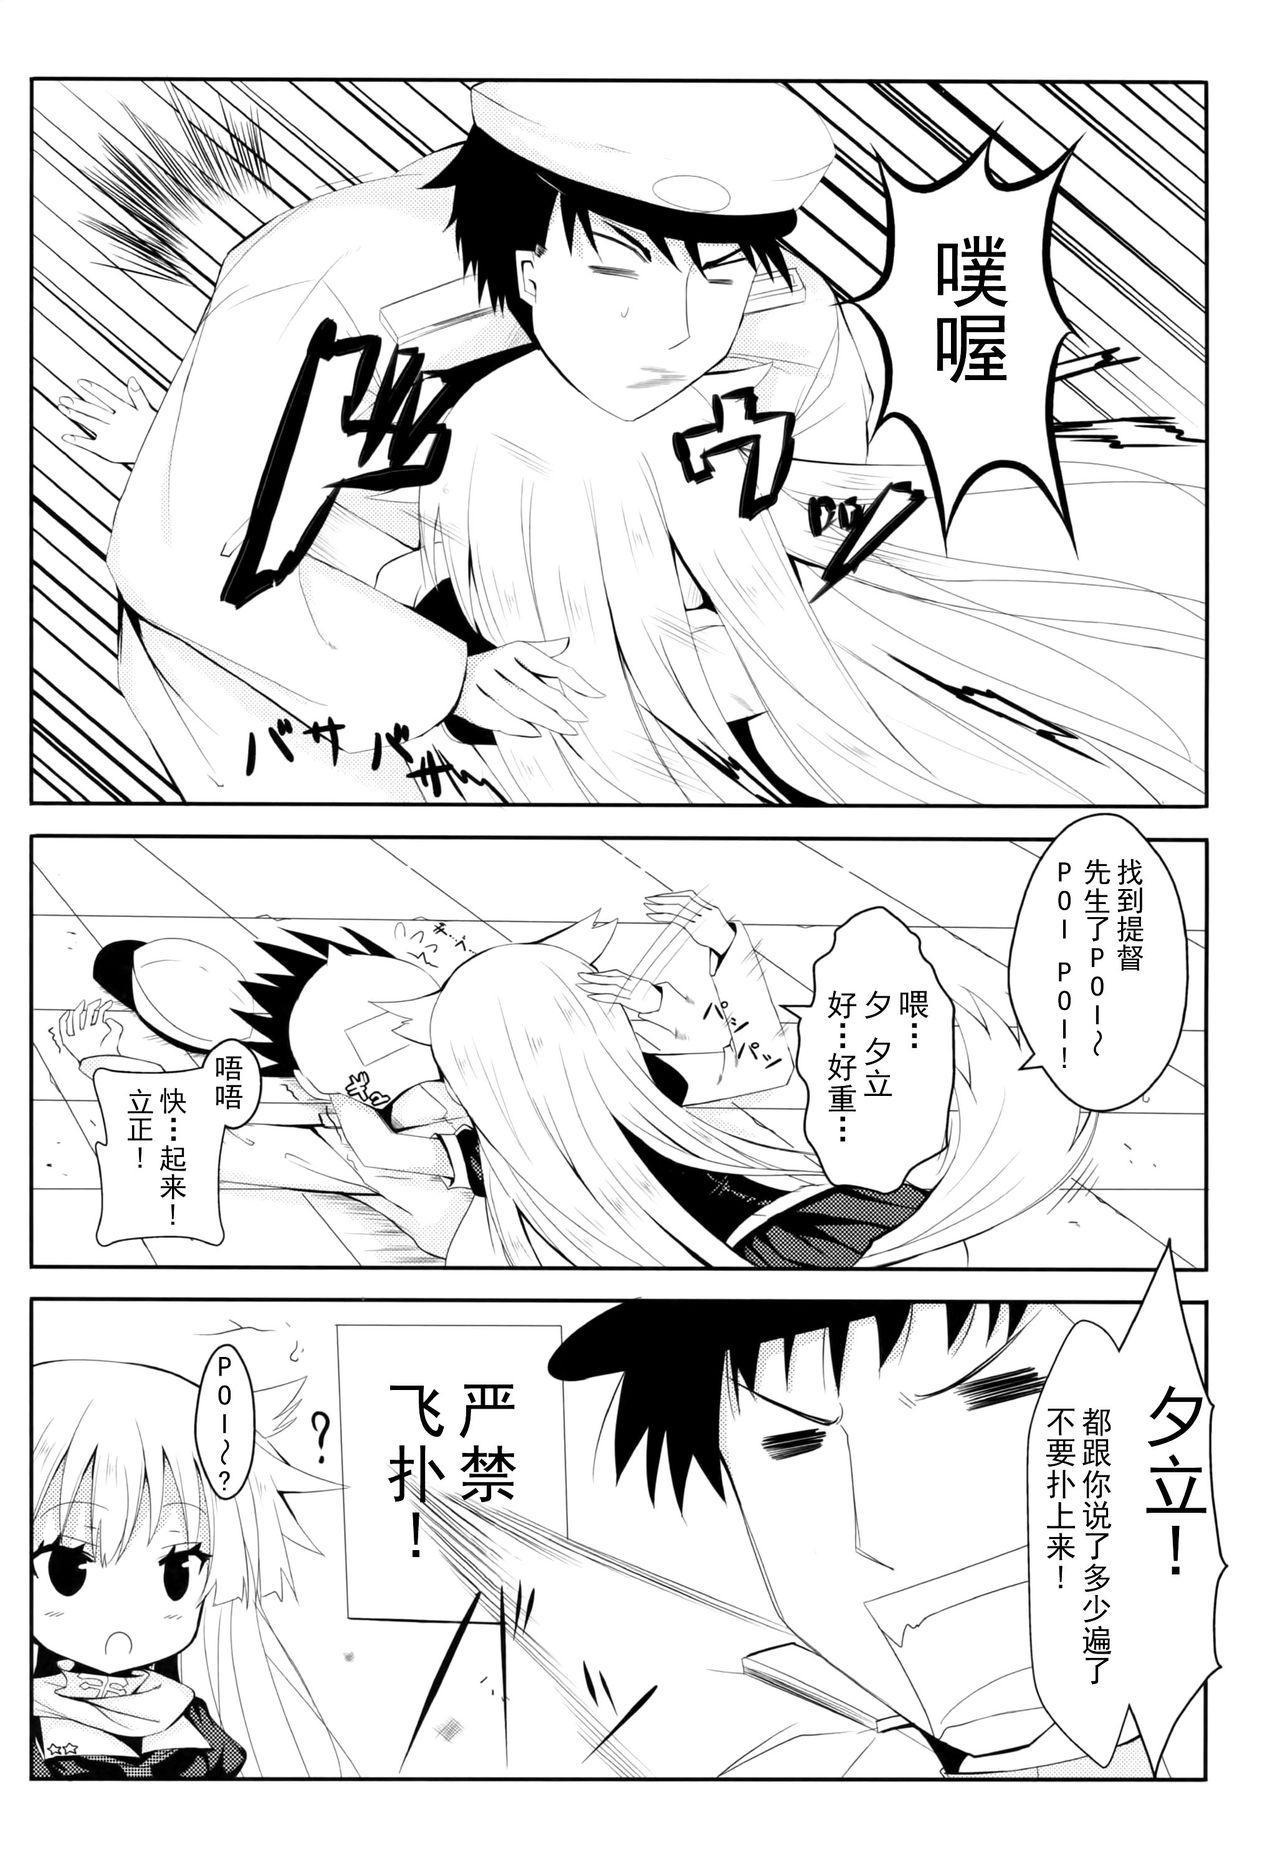 Yuudachi Skinship 3